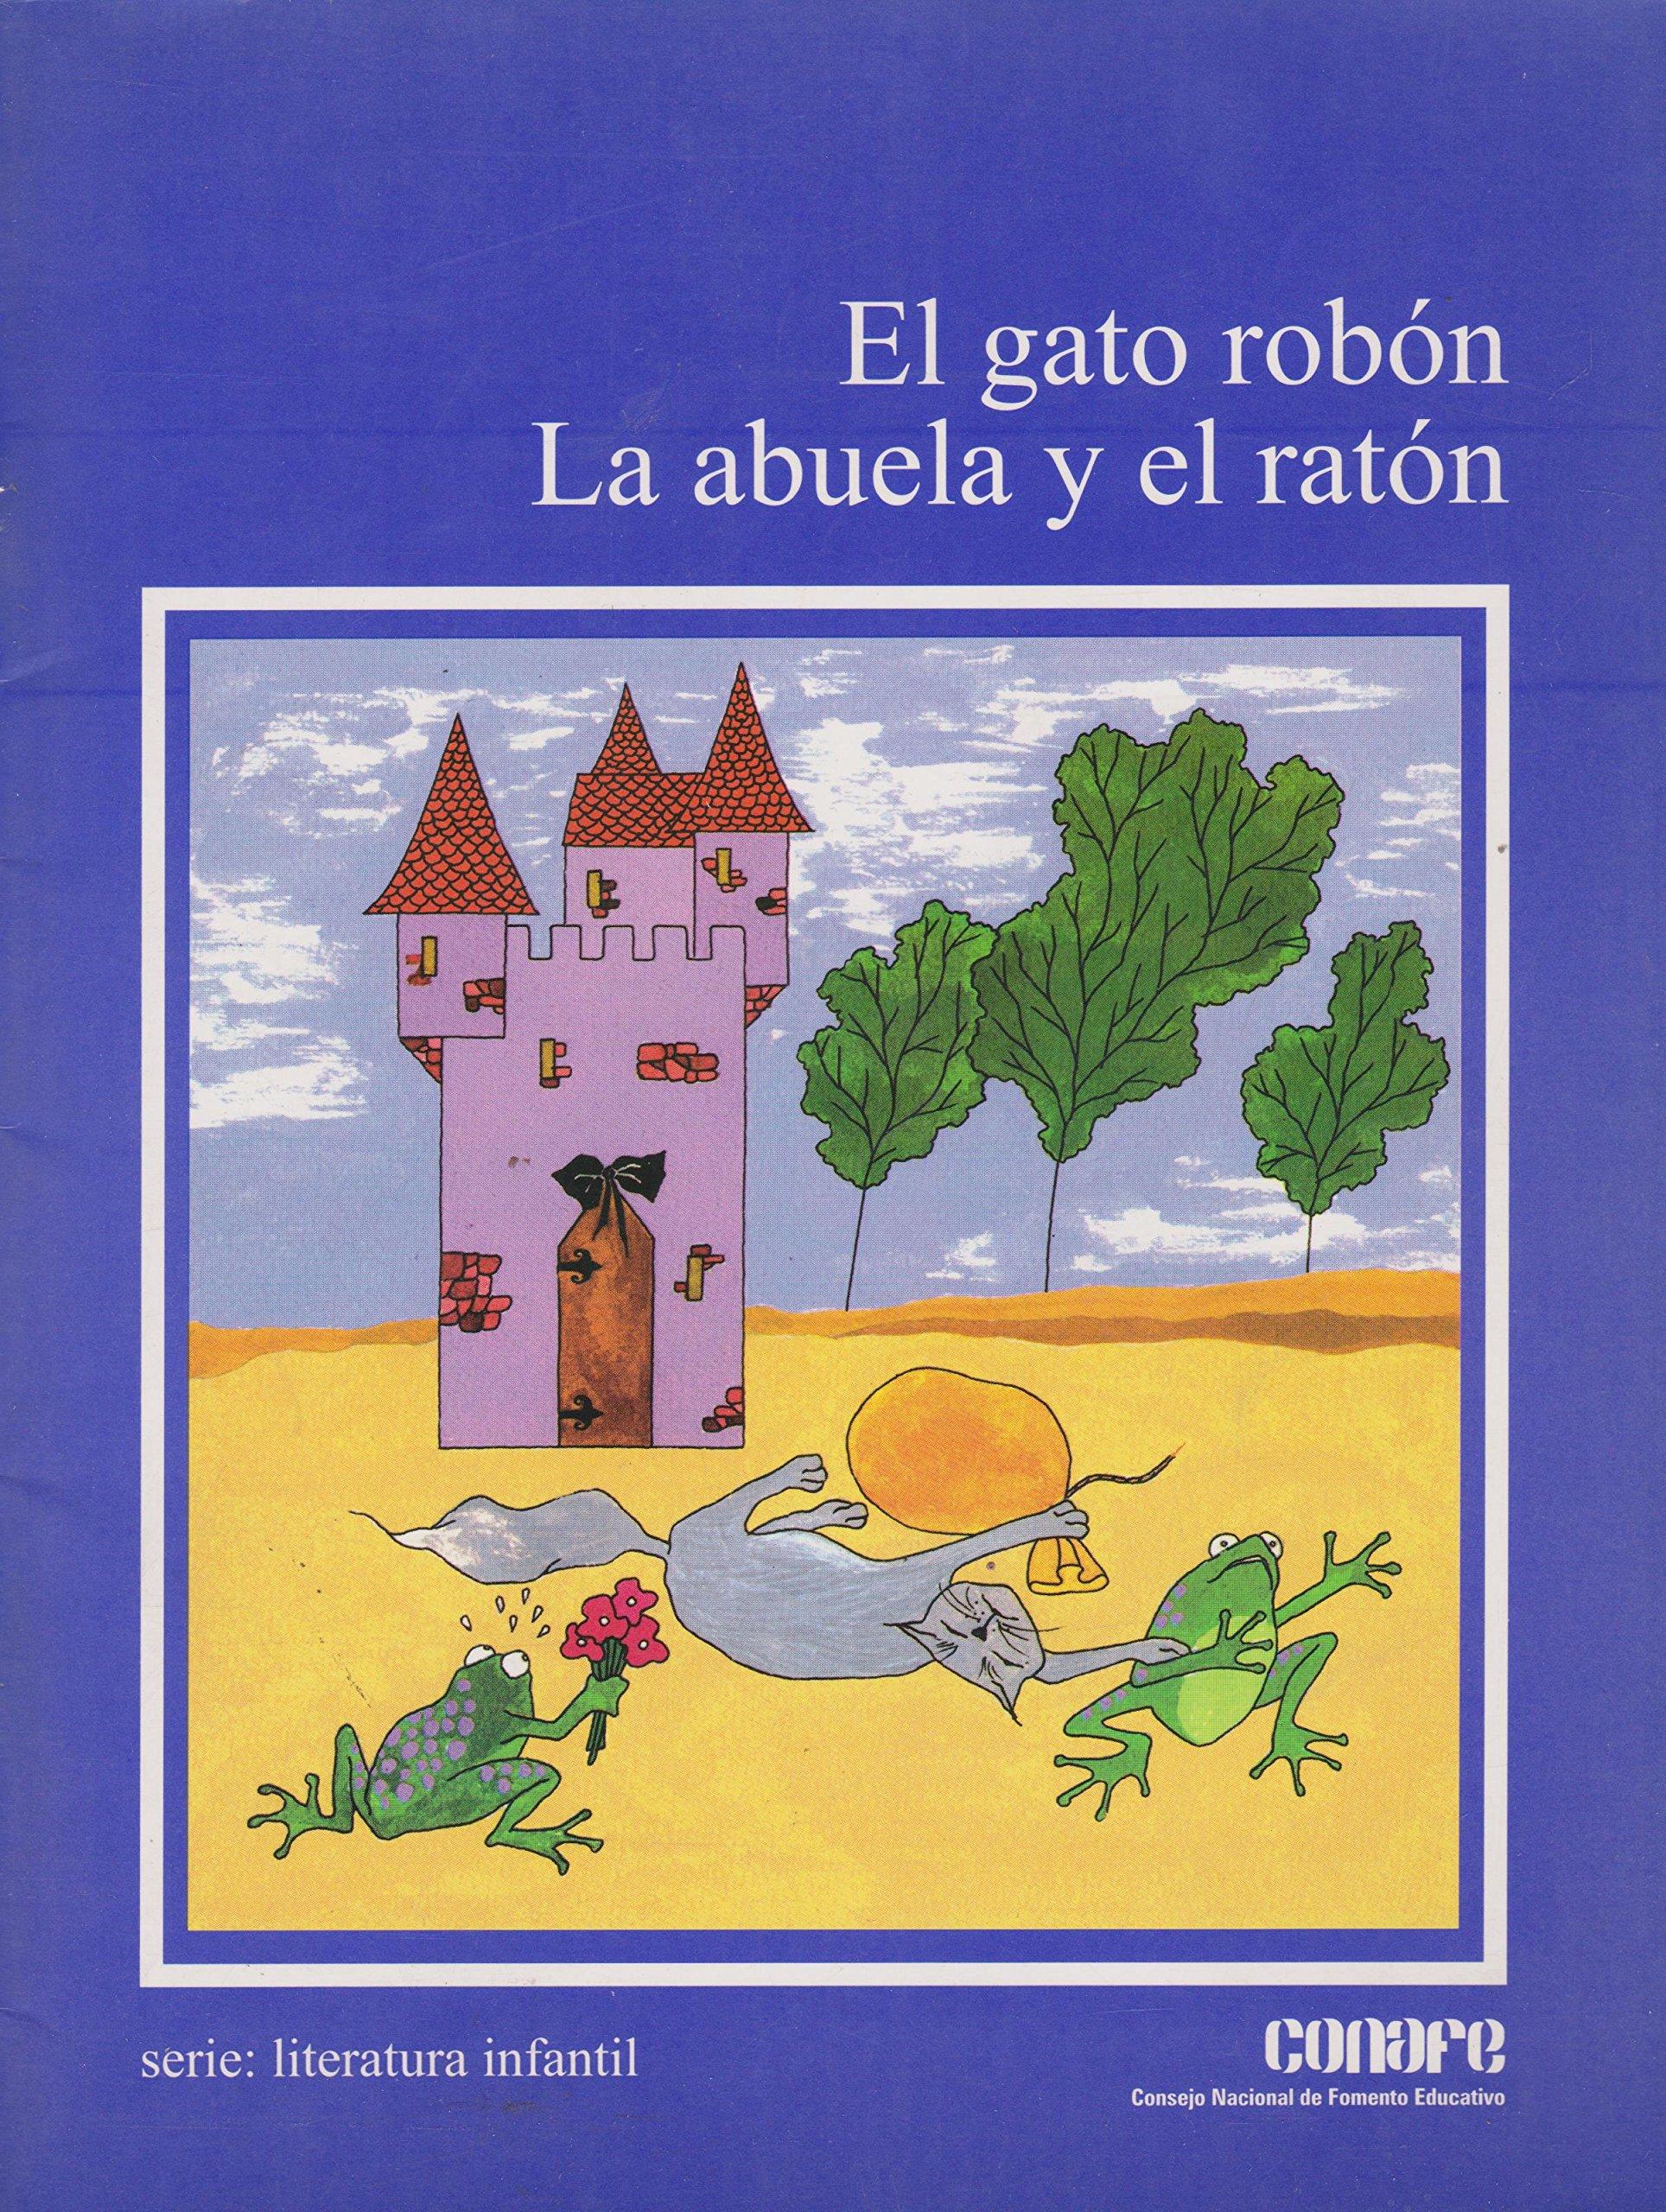 El gato robon/ La abuela y el raton (Spanish Edition) (Spanish) Paperback – January 1, 1996